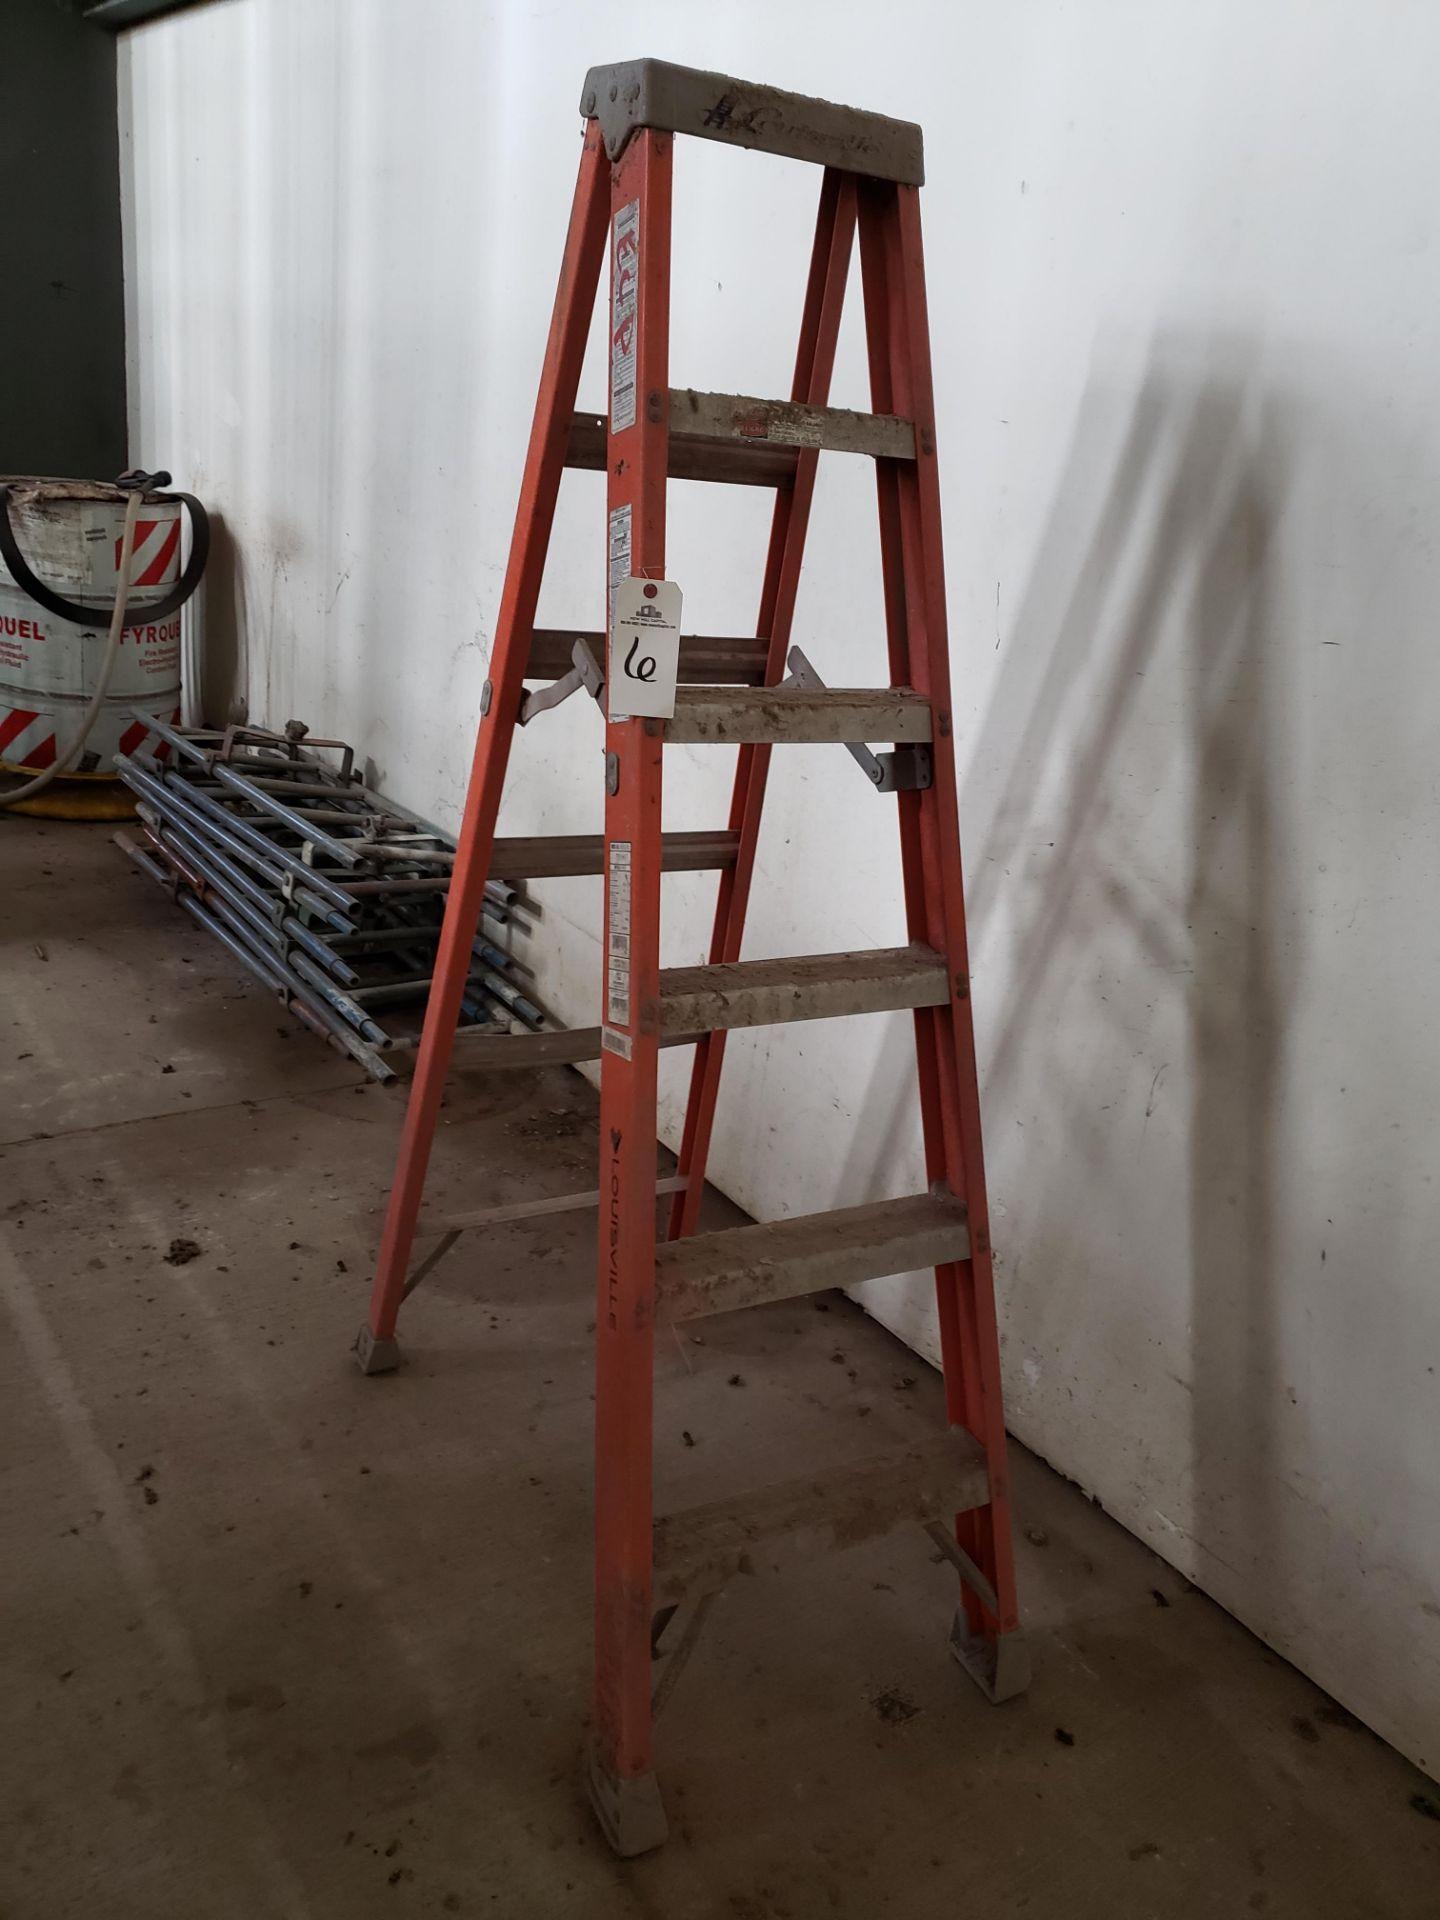 Lot 6 - 6' Step Ladder   Rig Fee: $25